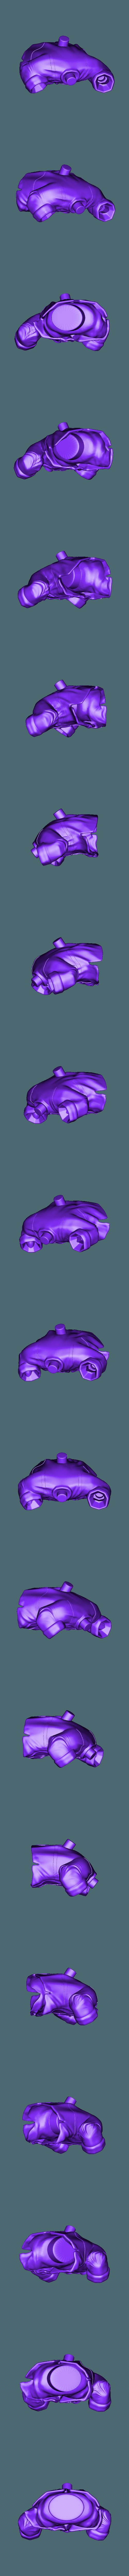 Master_roshi_corps.stl Download free STL file Master Roshi Dragon Ball Z • 3D printing object, Gatober